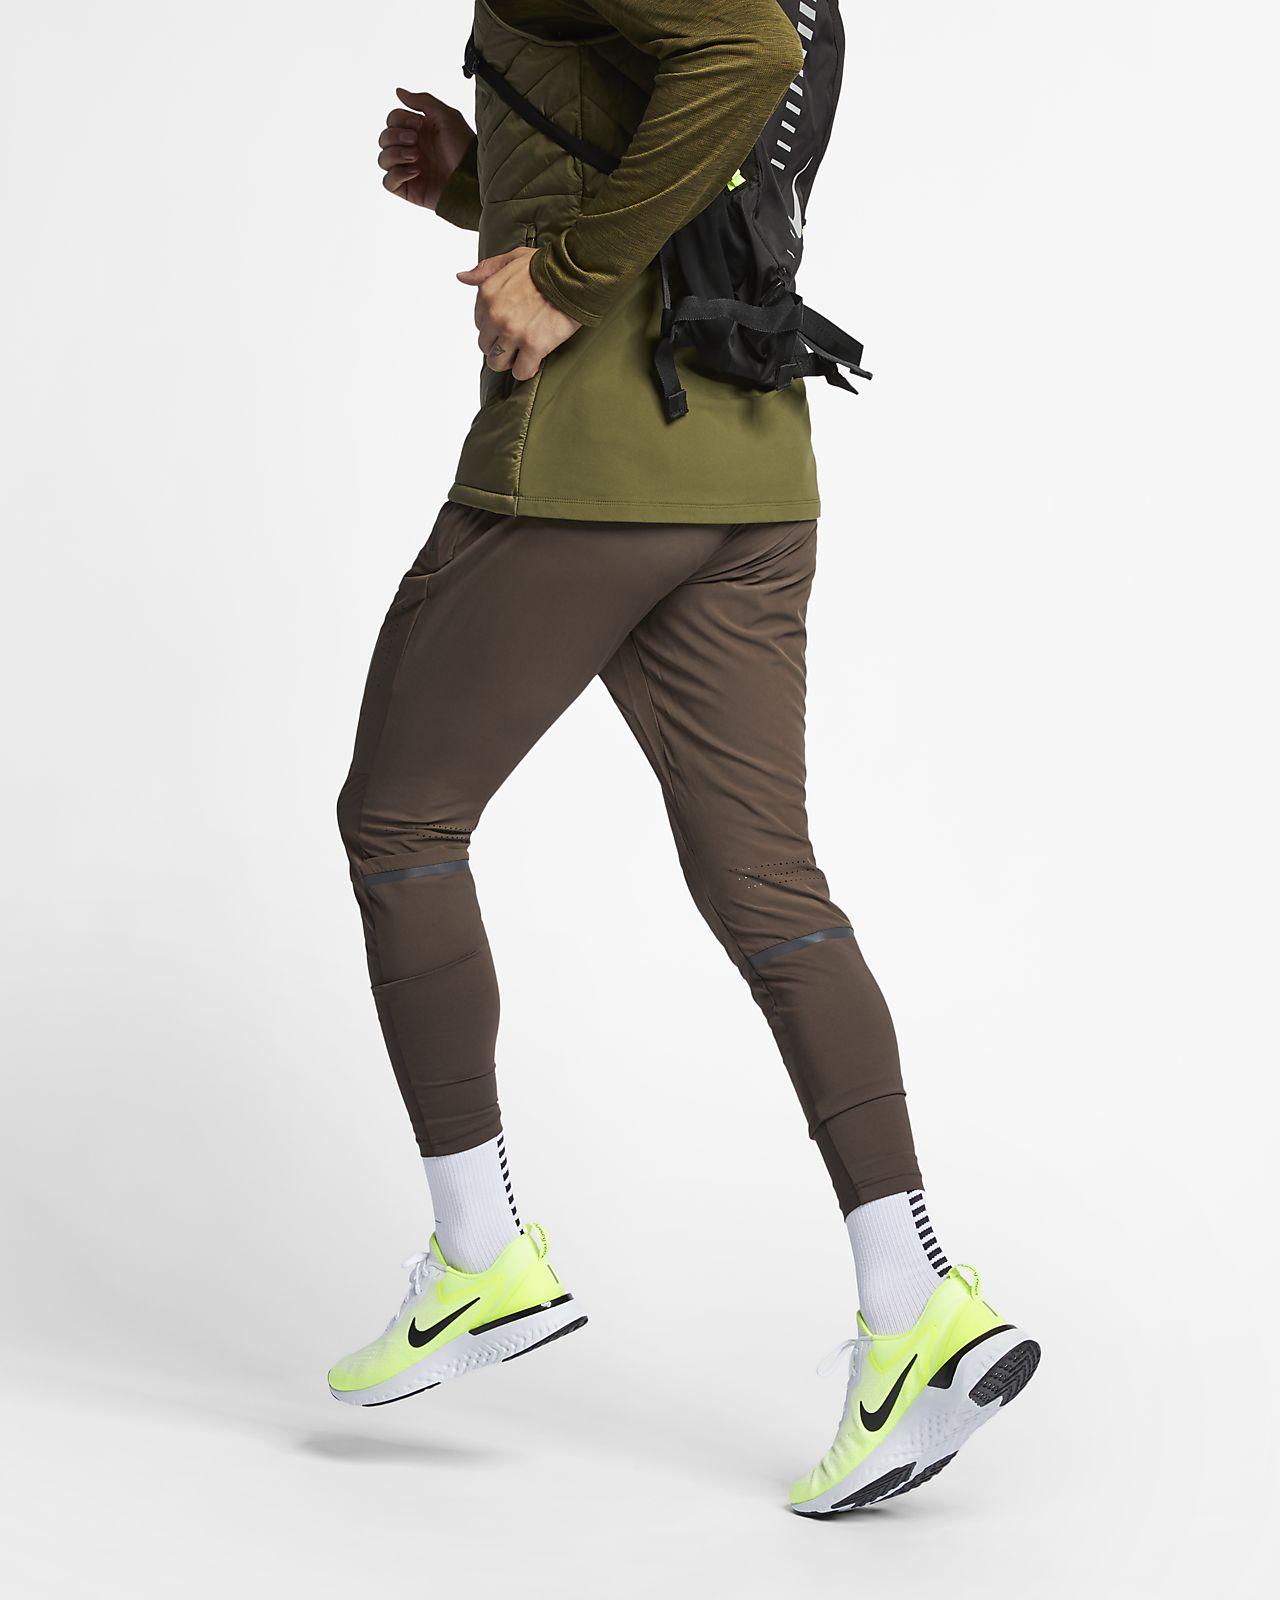 a0db08b9a9b8eb Nike Swift Herren-Laufhose. Nike.com DE